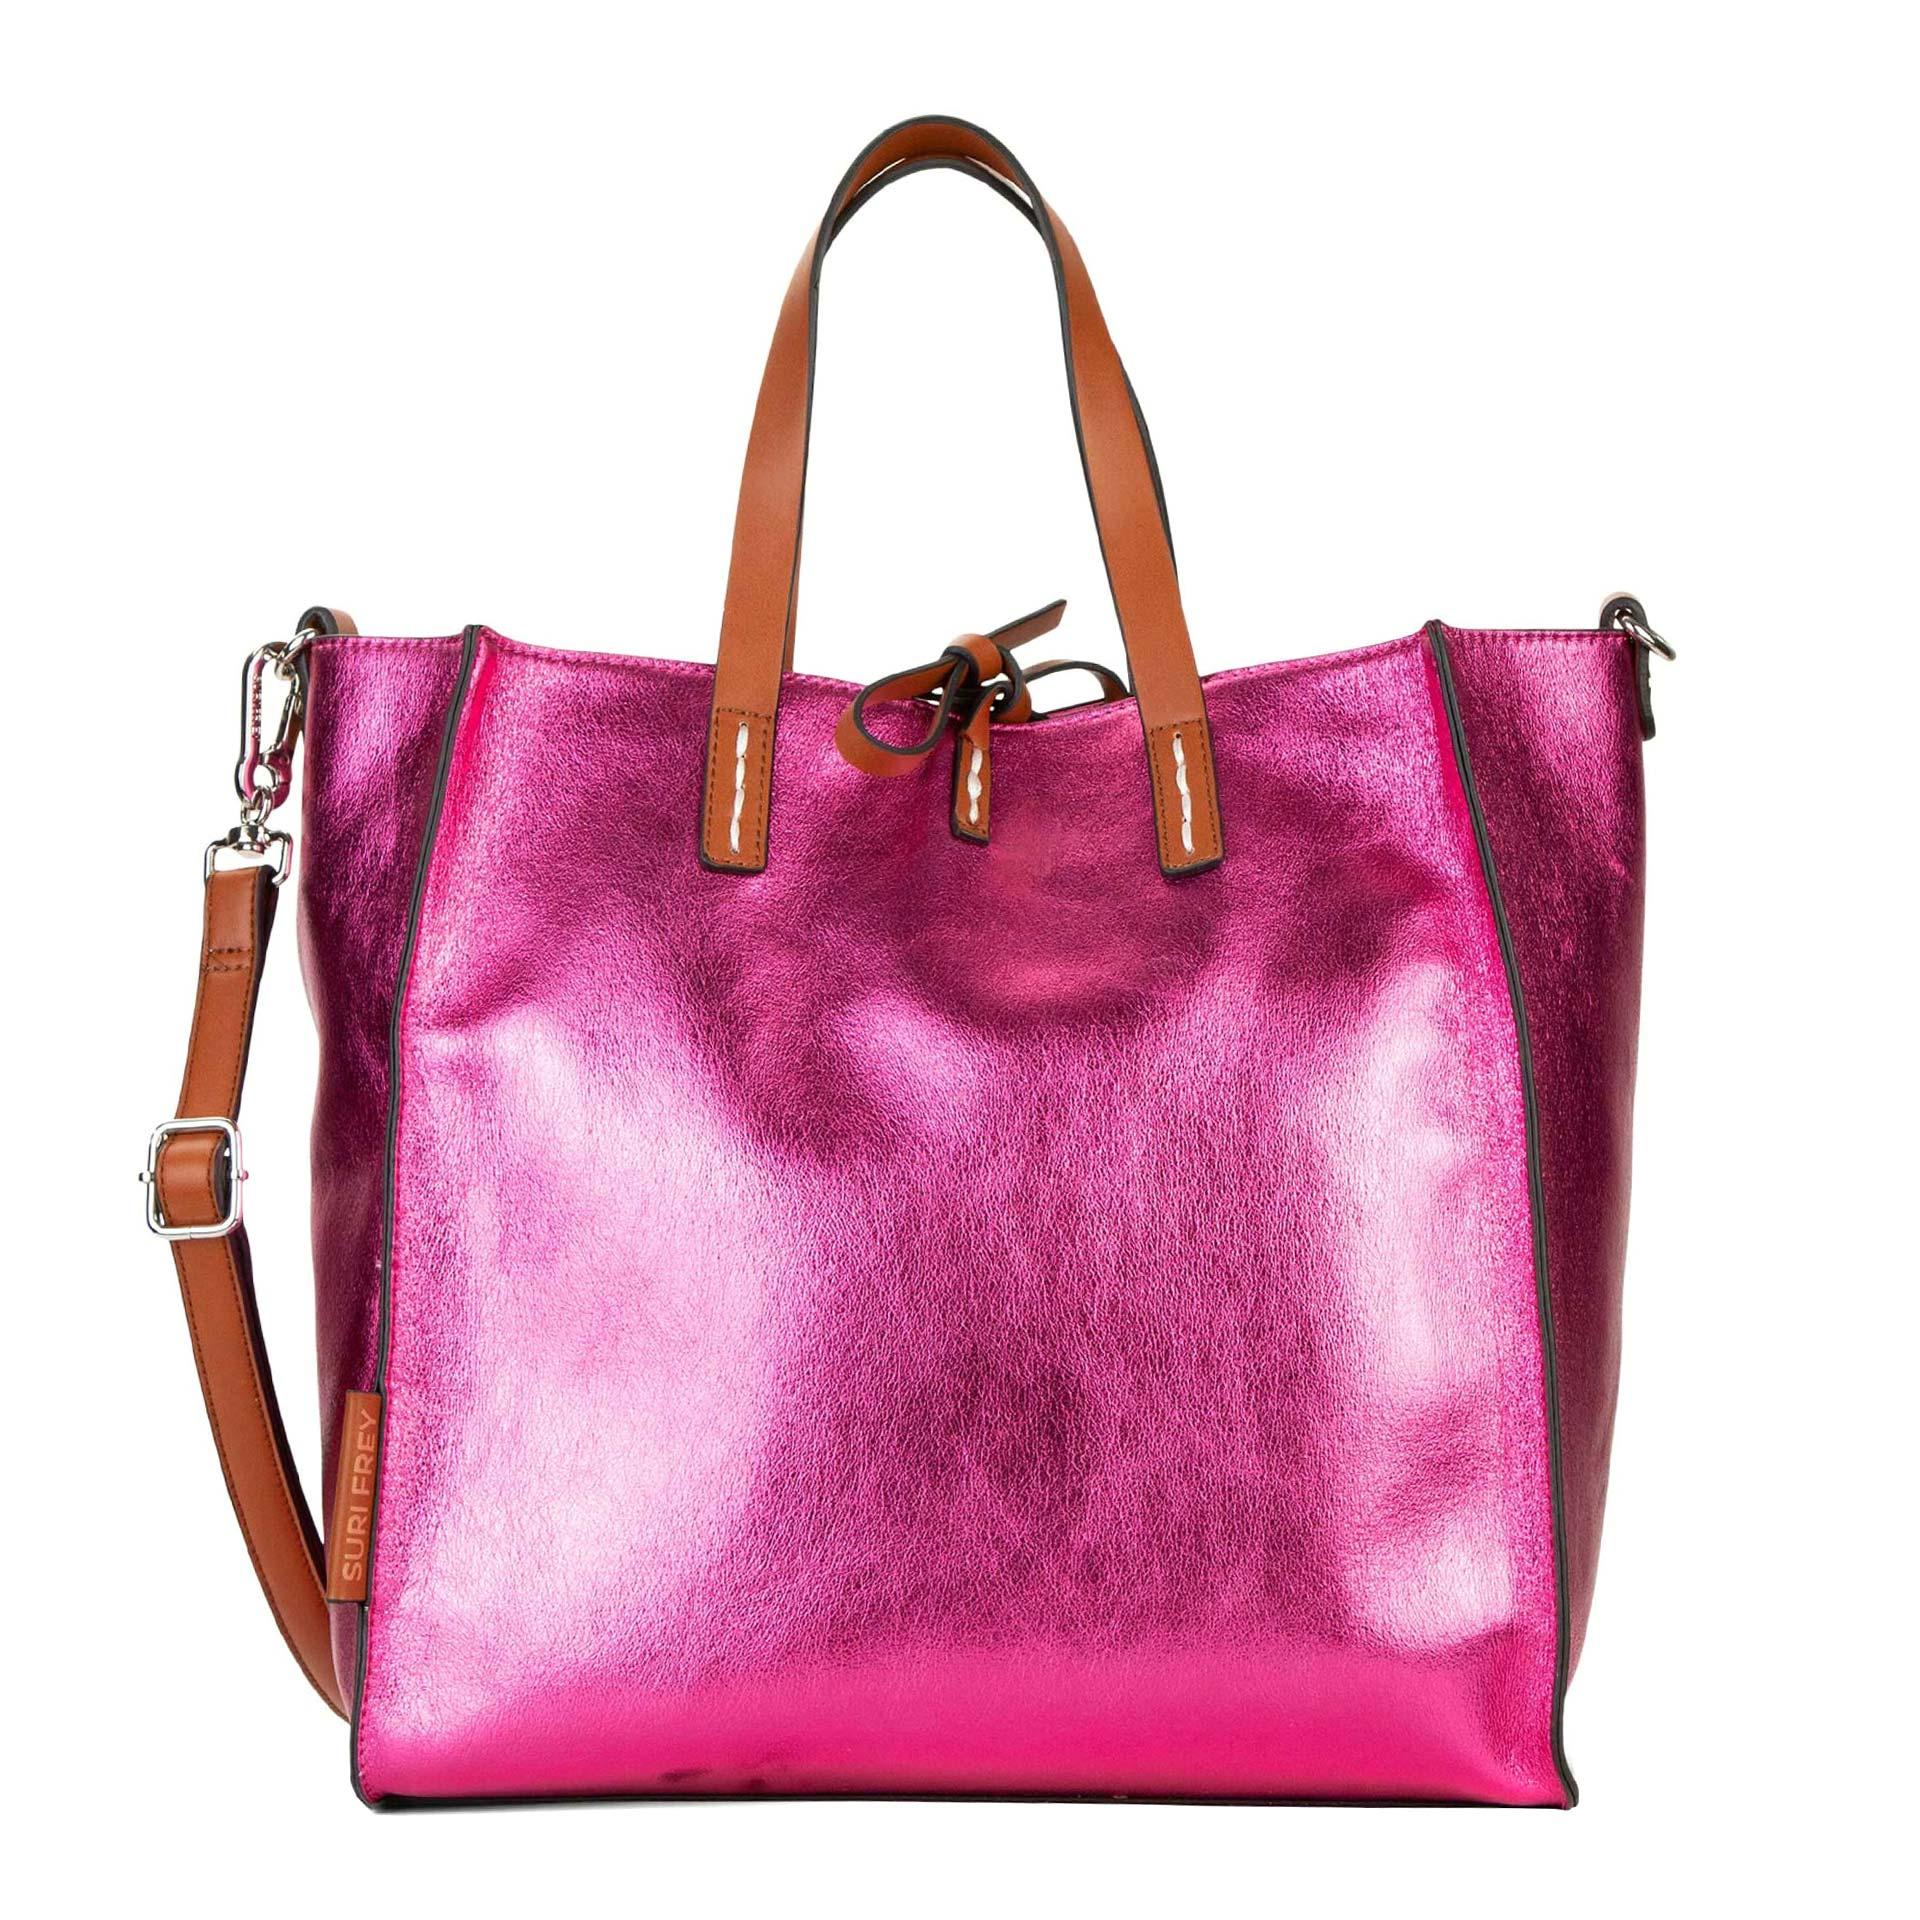 Suri Frey Suri Black Label Gracy Shopper metallic 2 in 1 pink